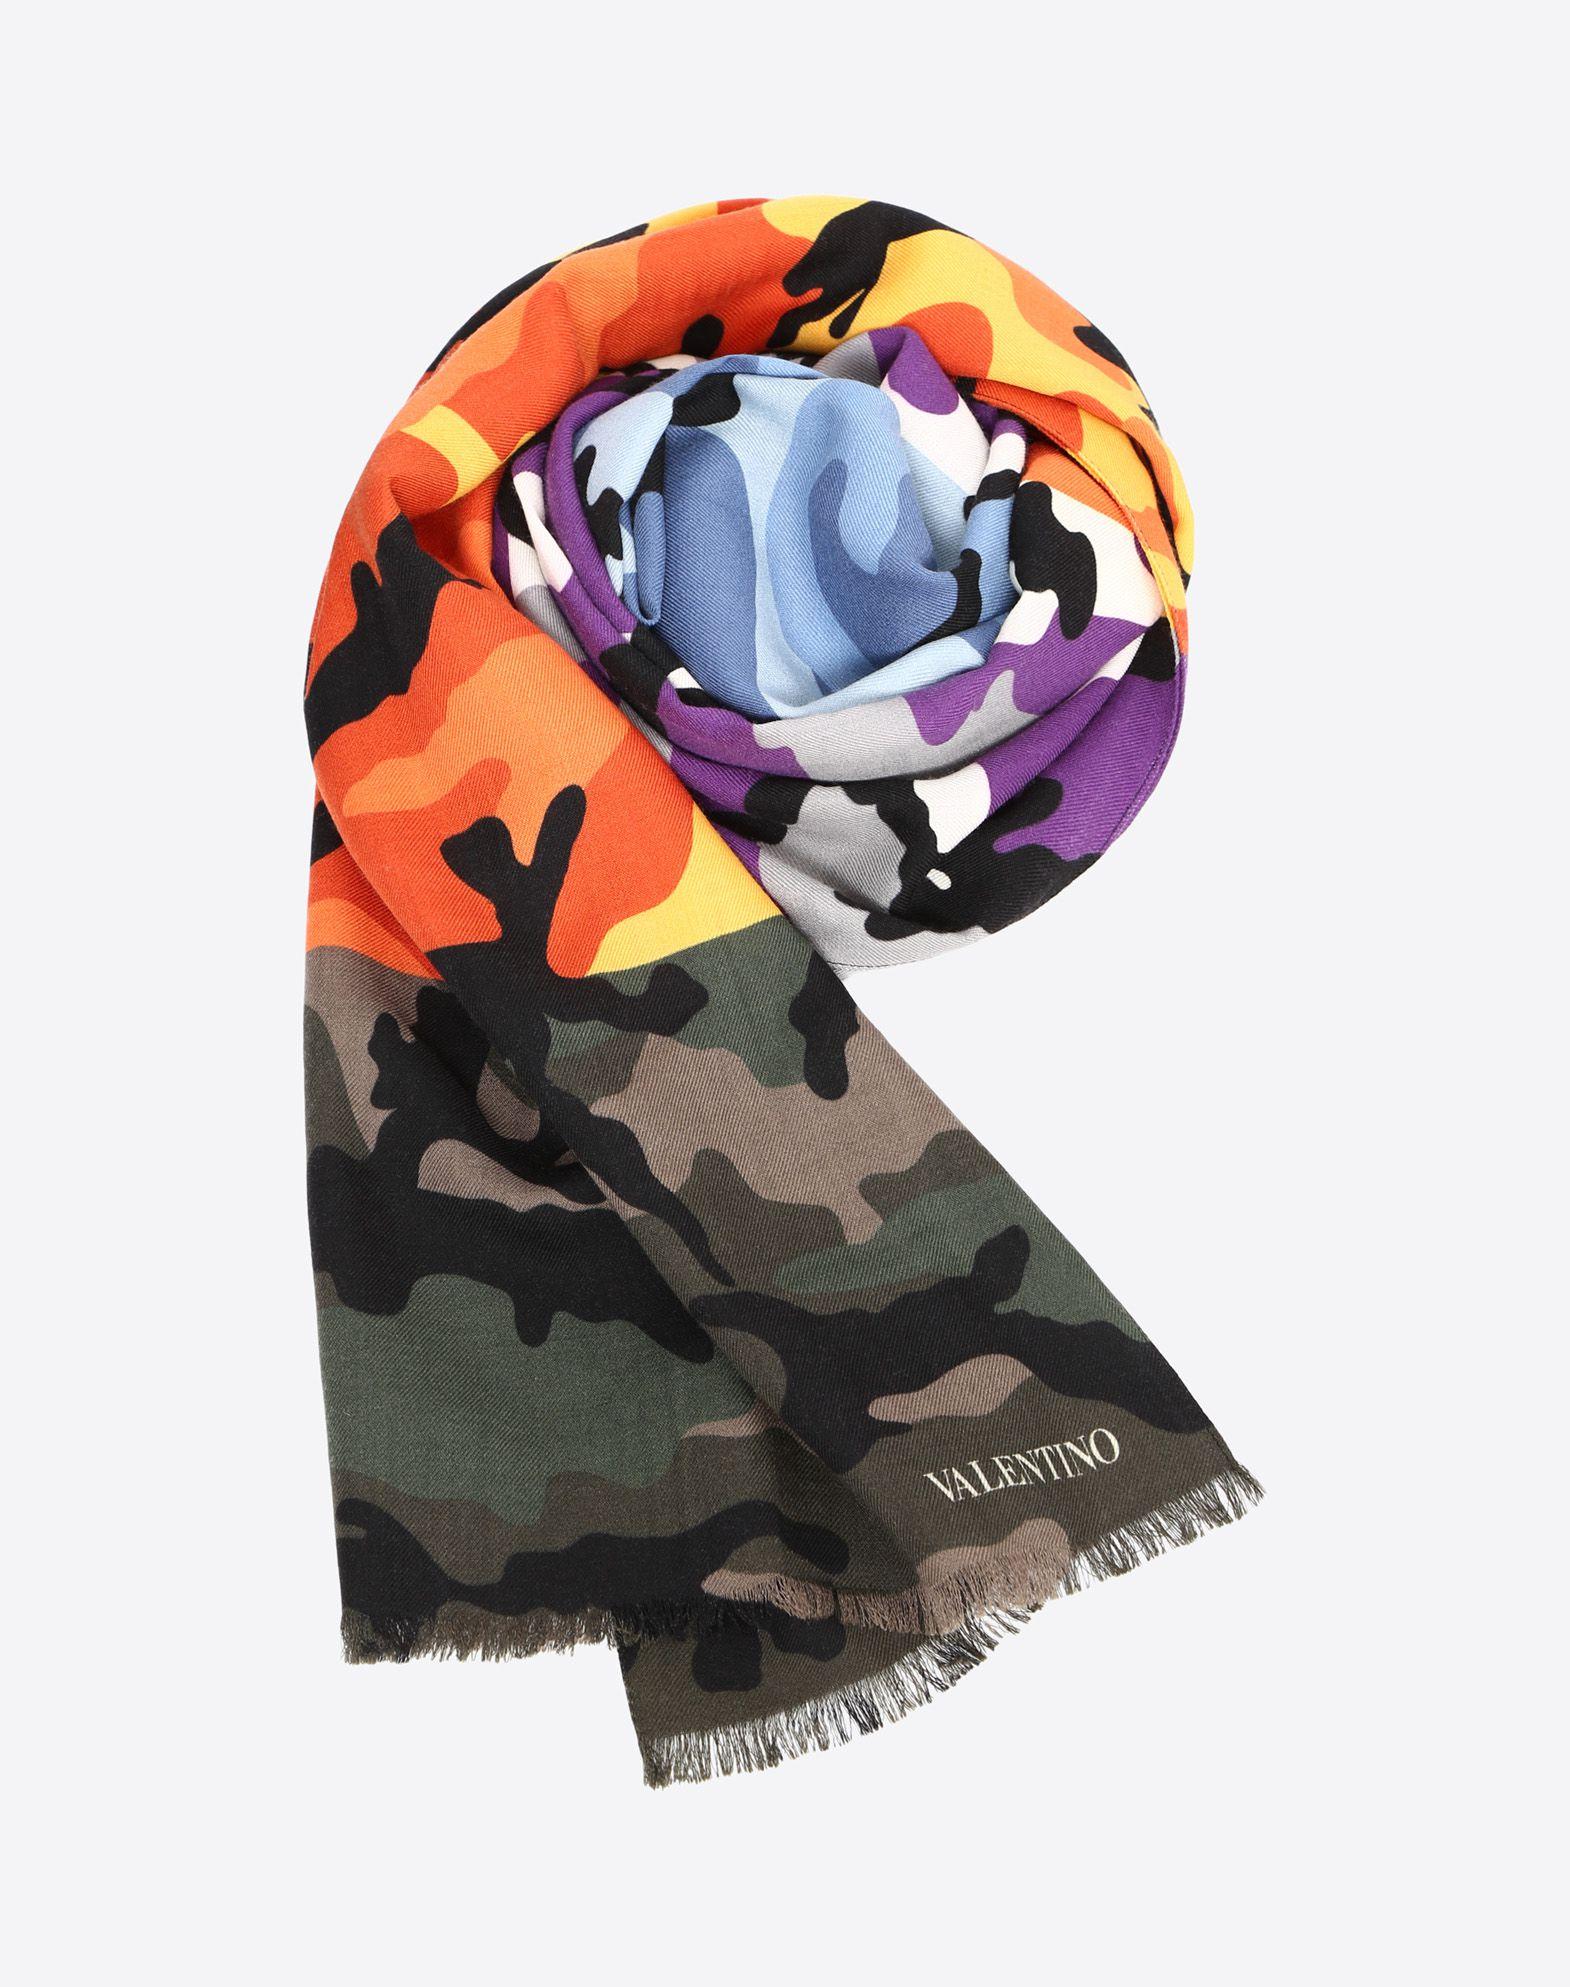 VALENTINO Gasa Flecos Logotipo Estampado militar  46588907fr